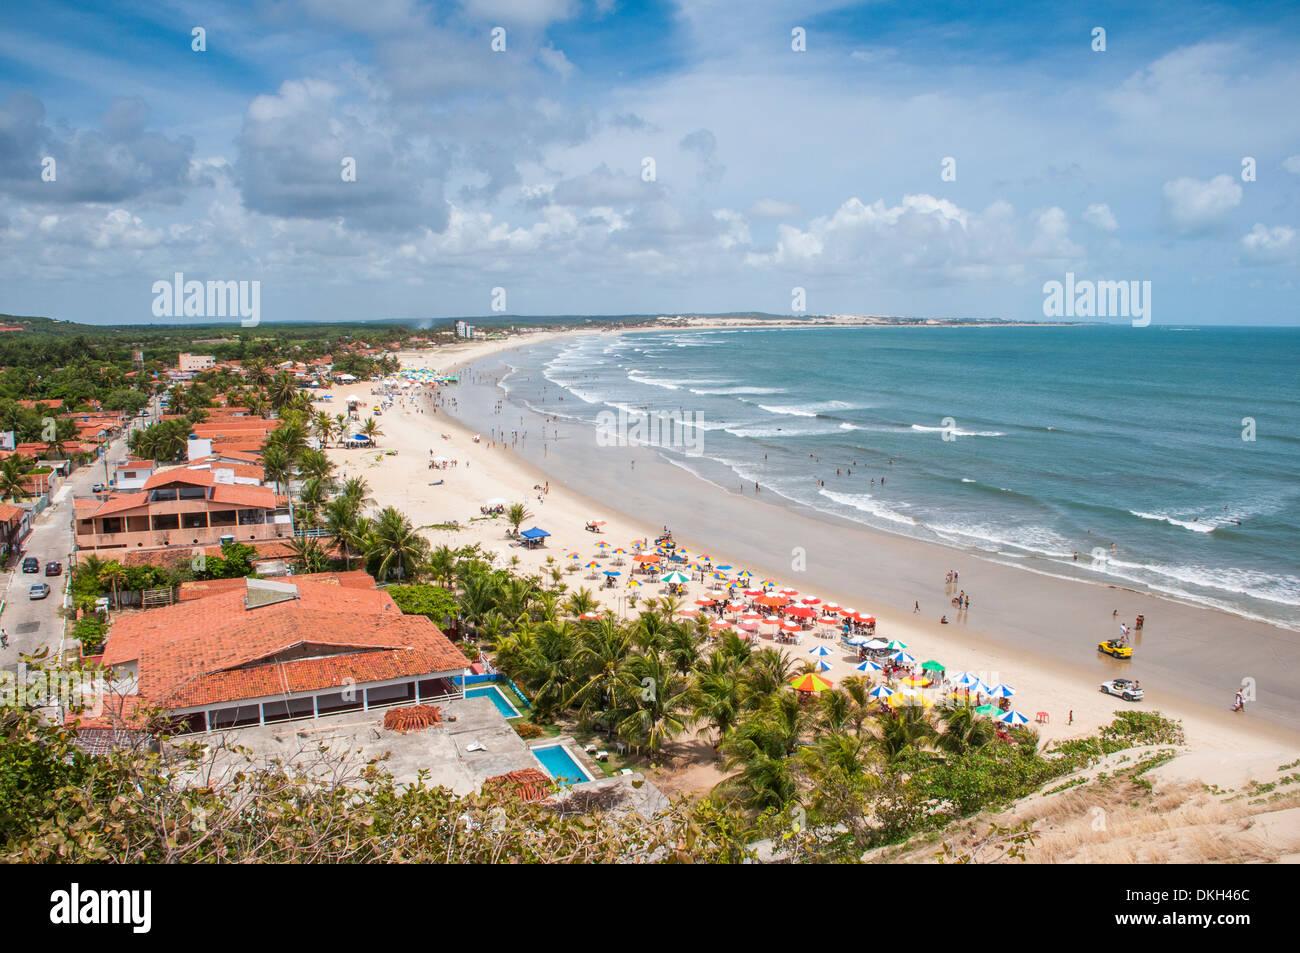 Beautiful beach below the sand dunes of Natal, Rio Grande do Norte, Brazil, South America - Stock Image